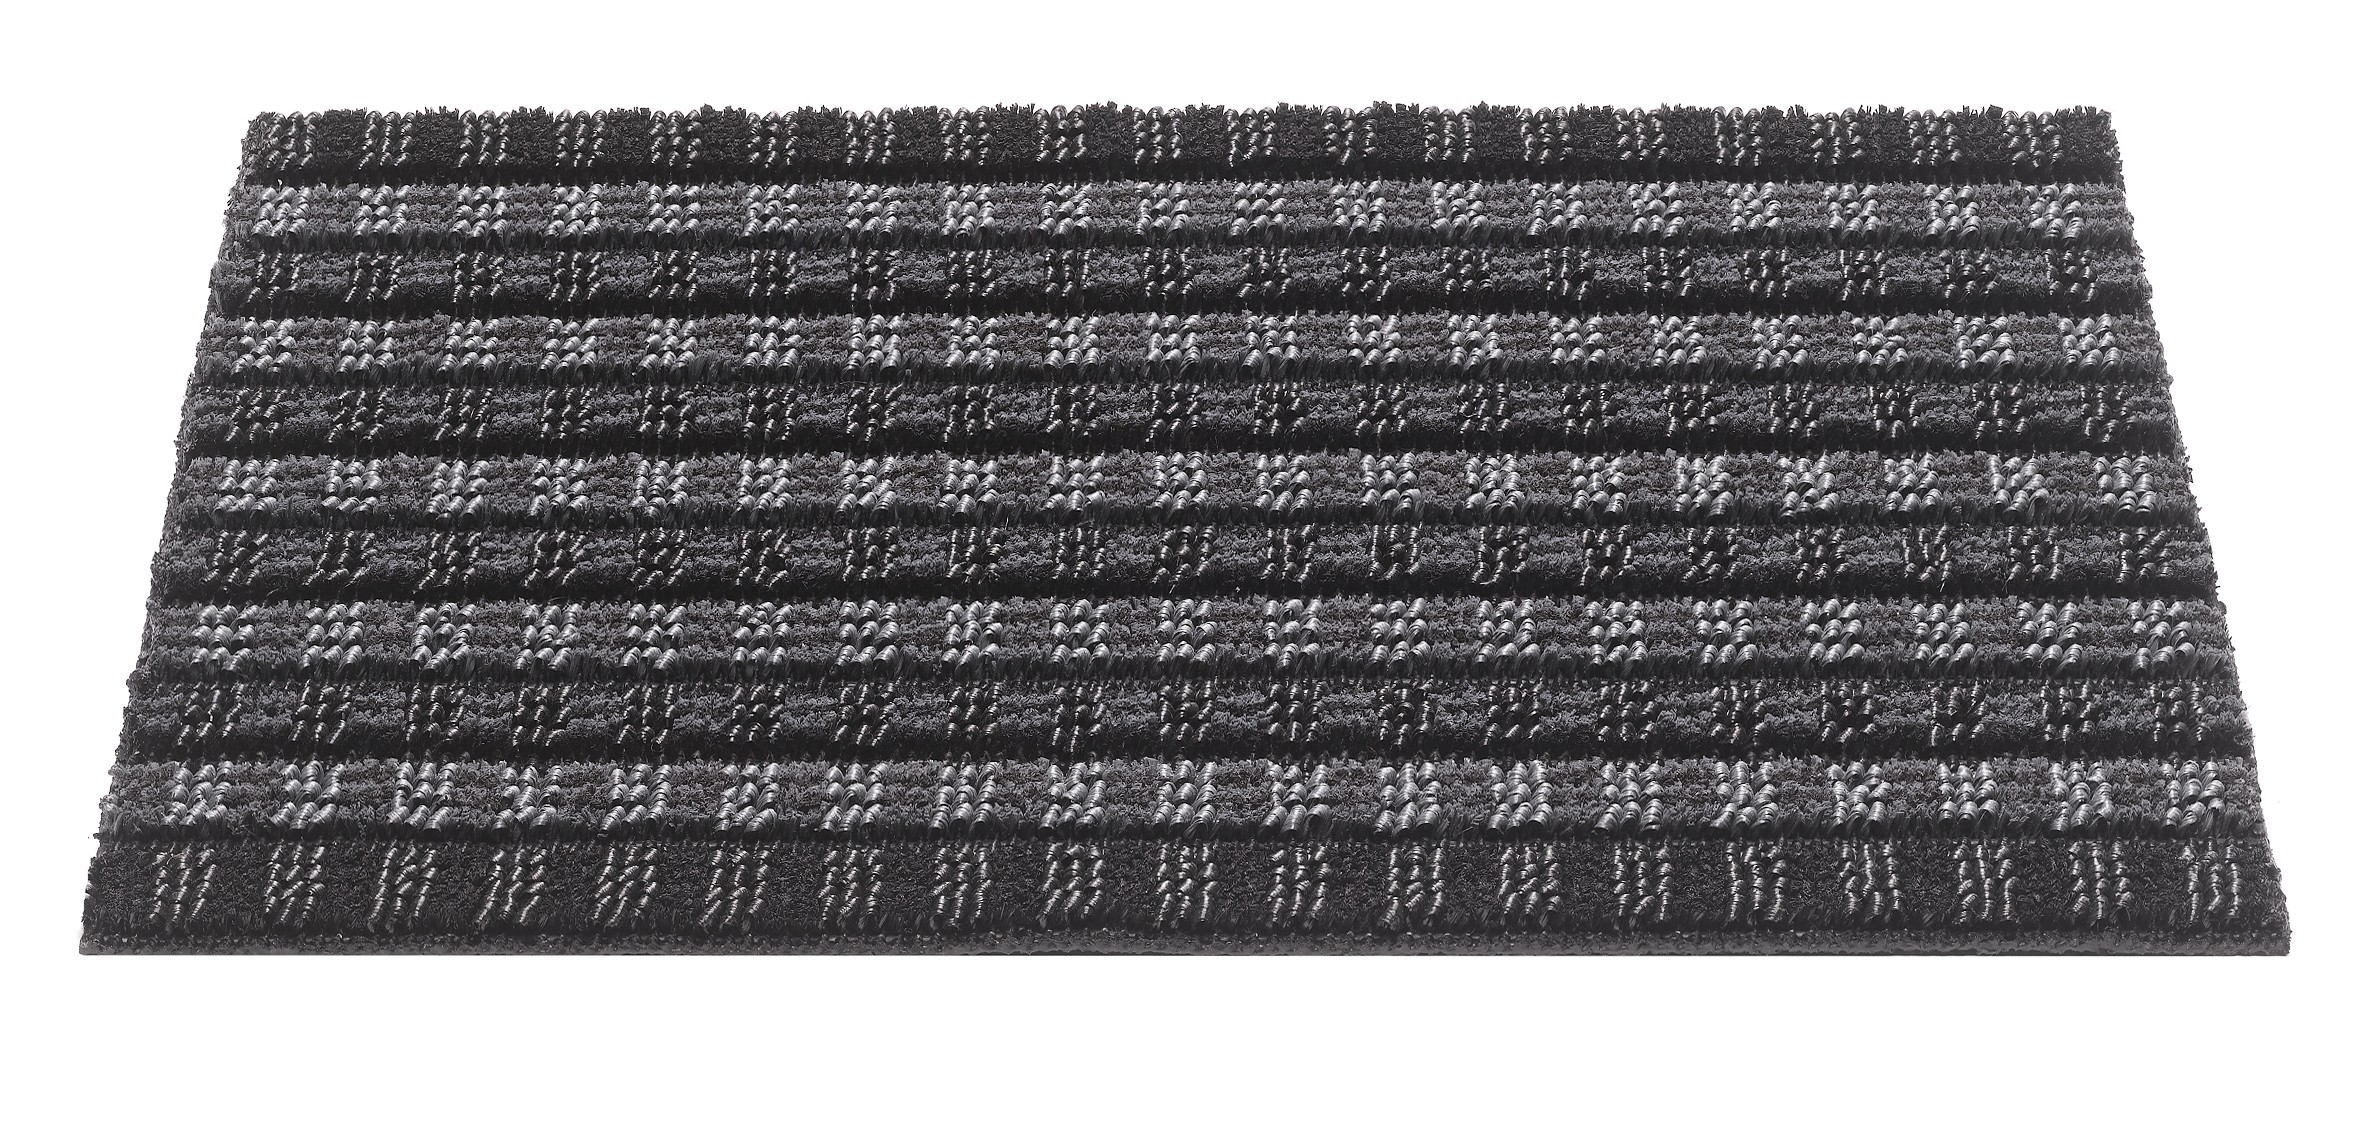 Hamat Fußmatte / Außenmatte Quadro Scrape 50x80cm graphite Bild 1